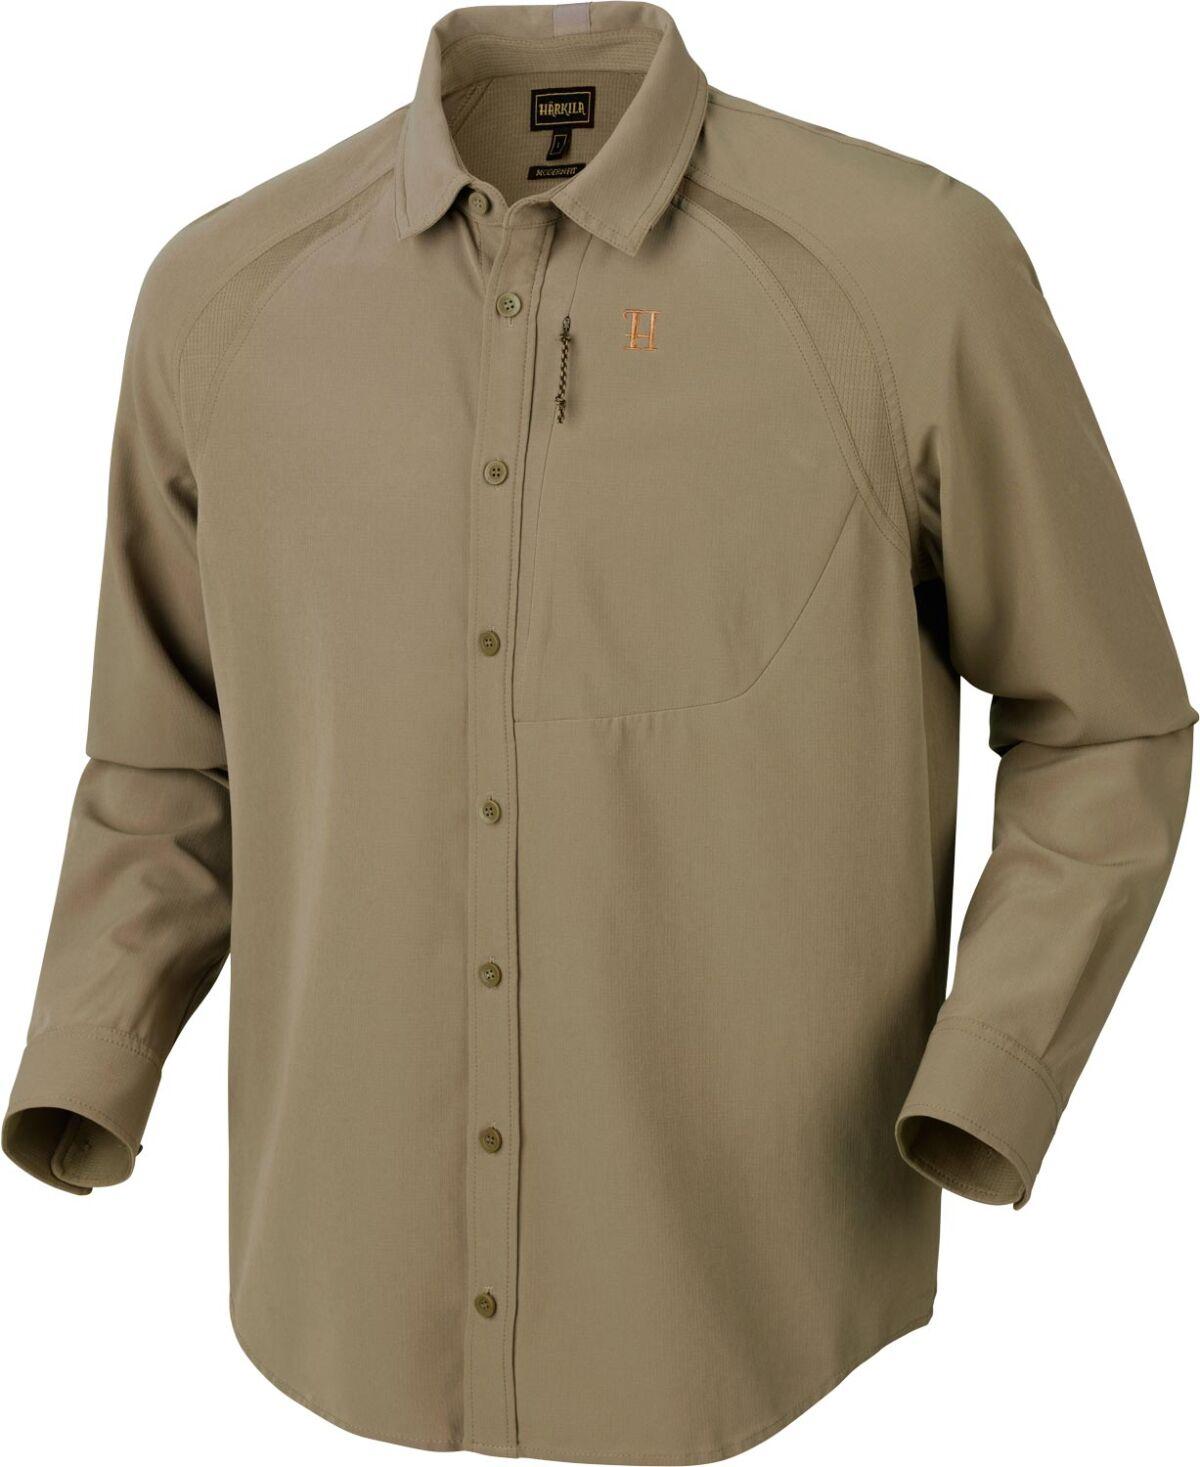 Рубашка Harkila Herlet Tech. Размер – S. Цвет – светлый хаки